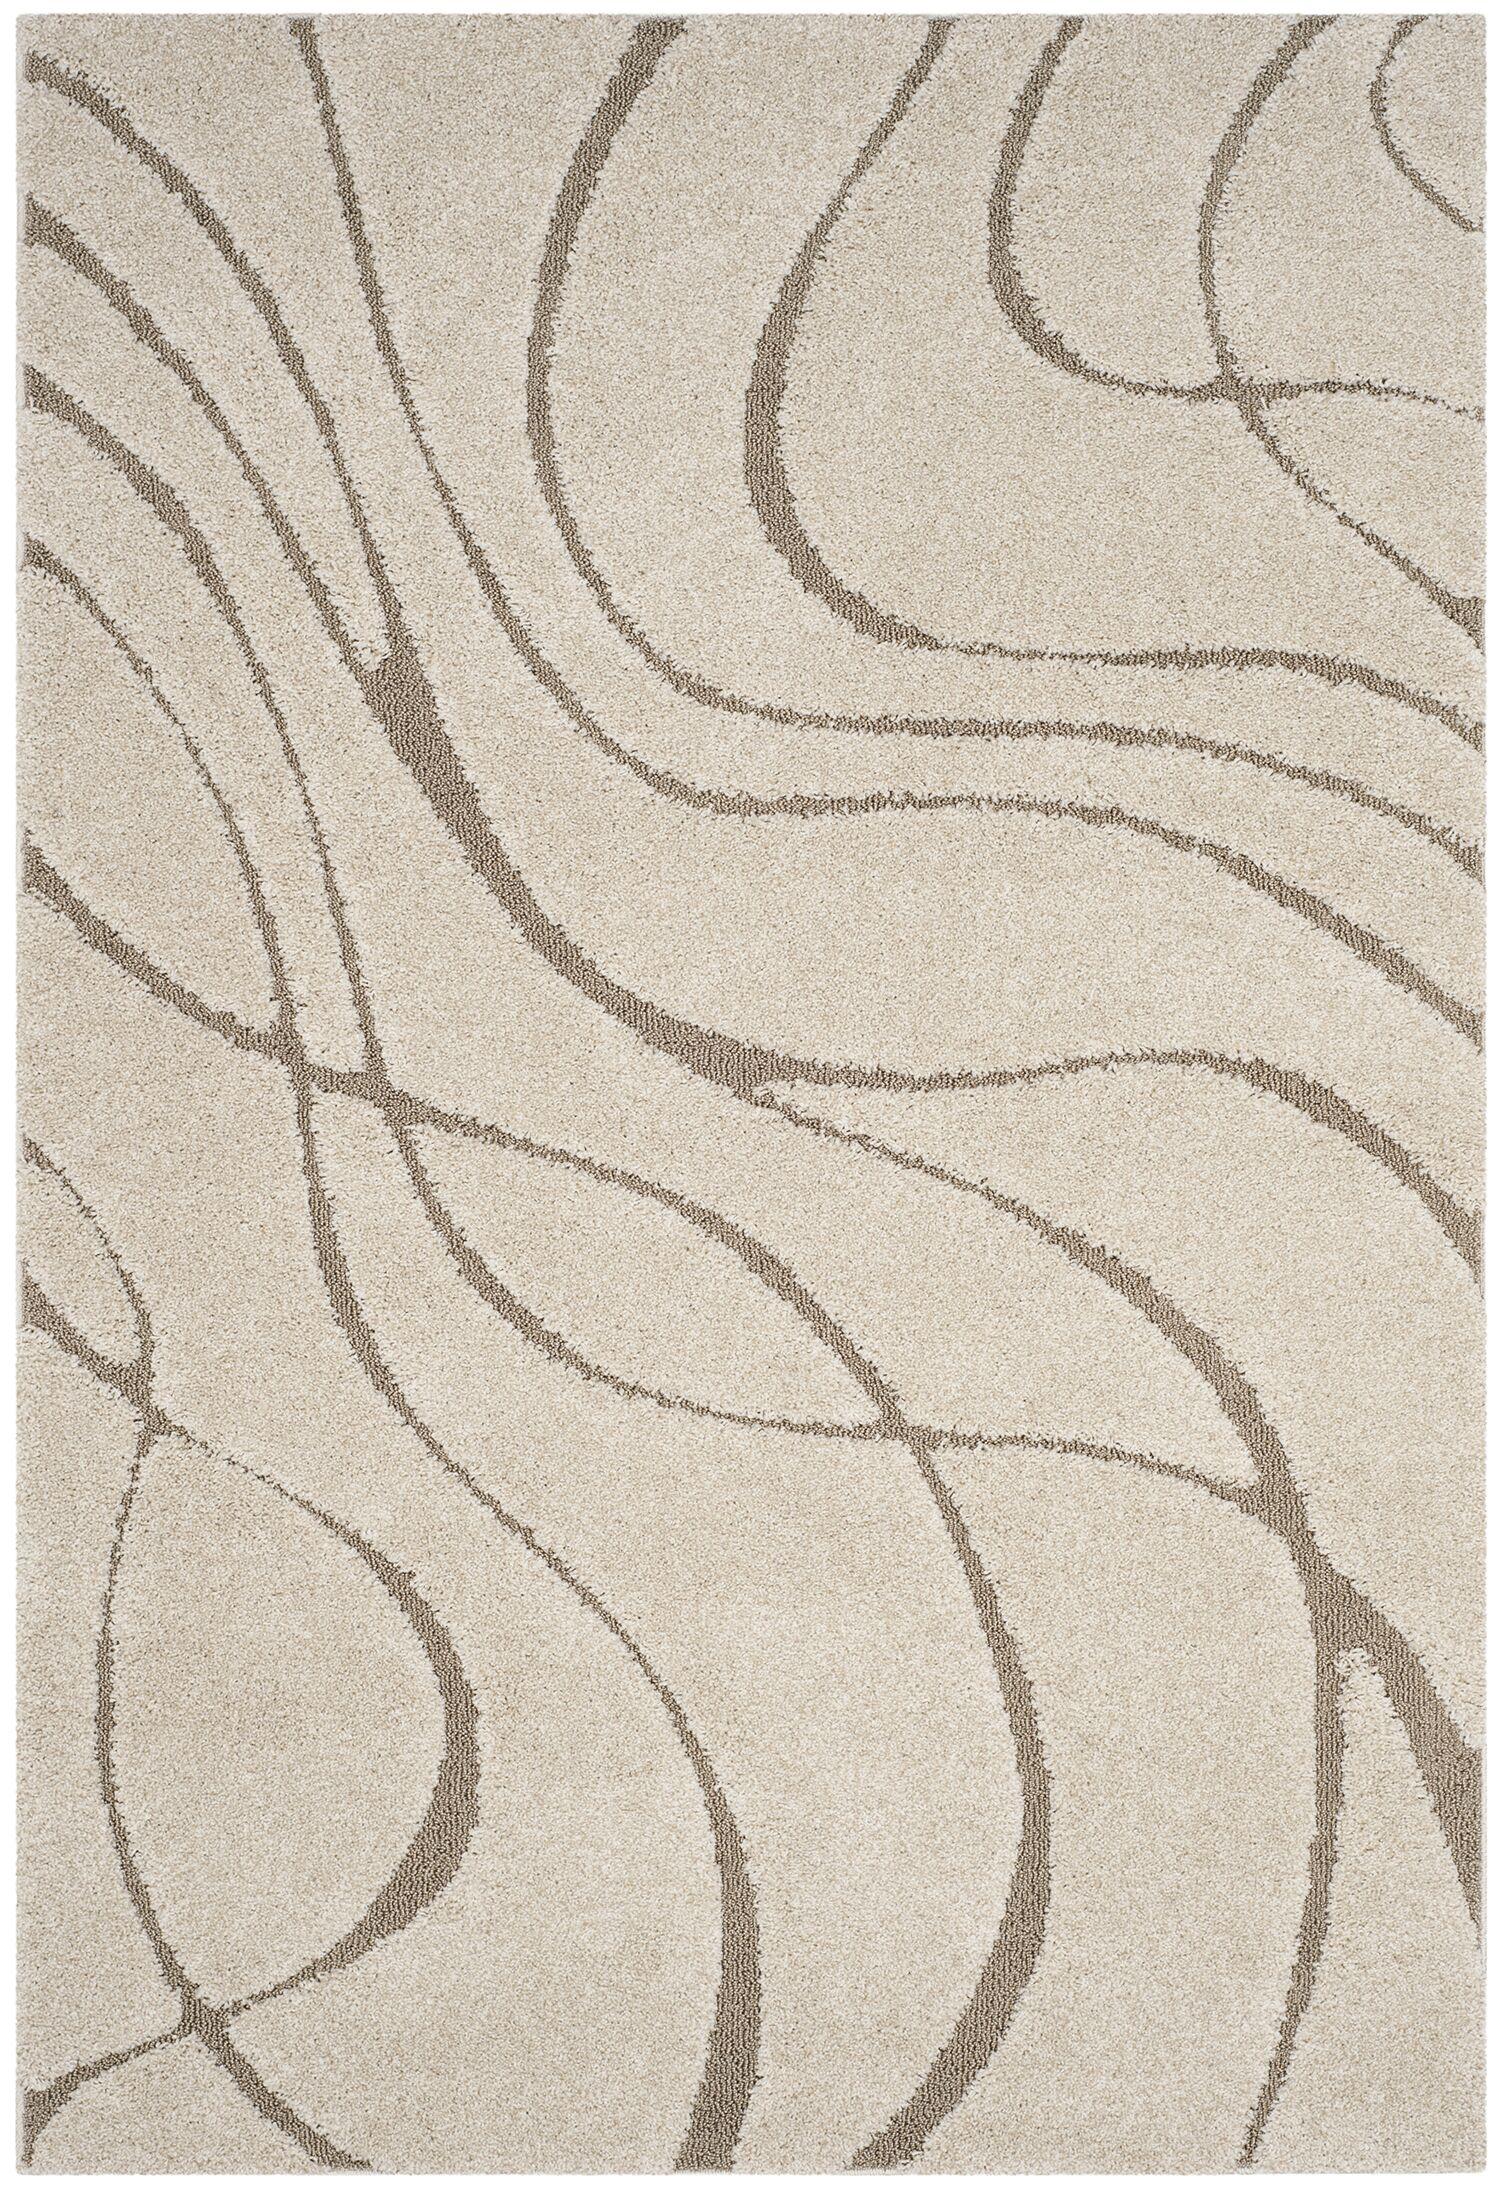 Enrique Cream/Beige Area Rug Rug Size: Rectangle 9'6